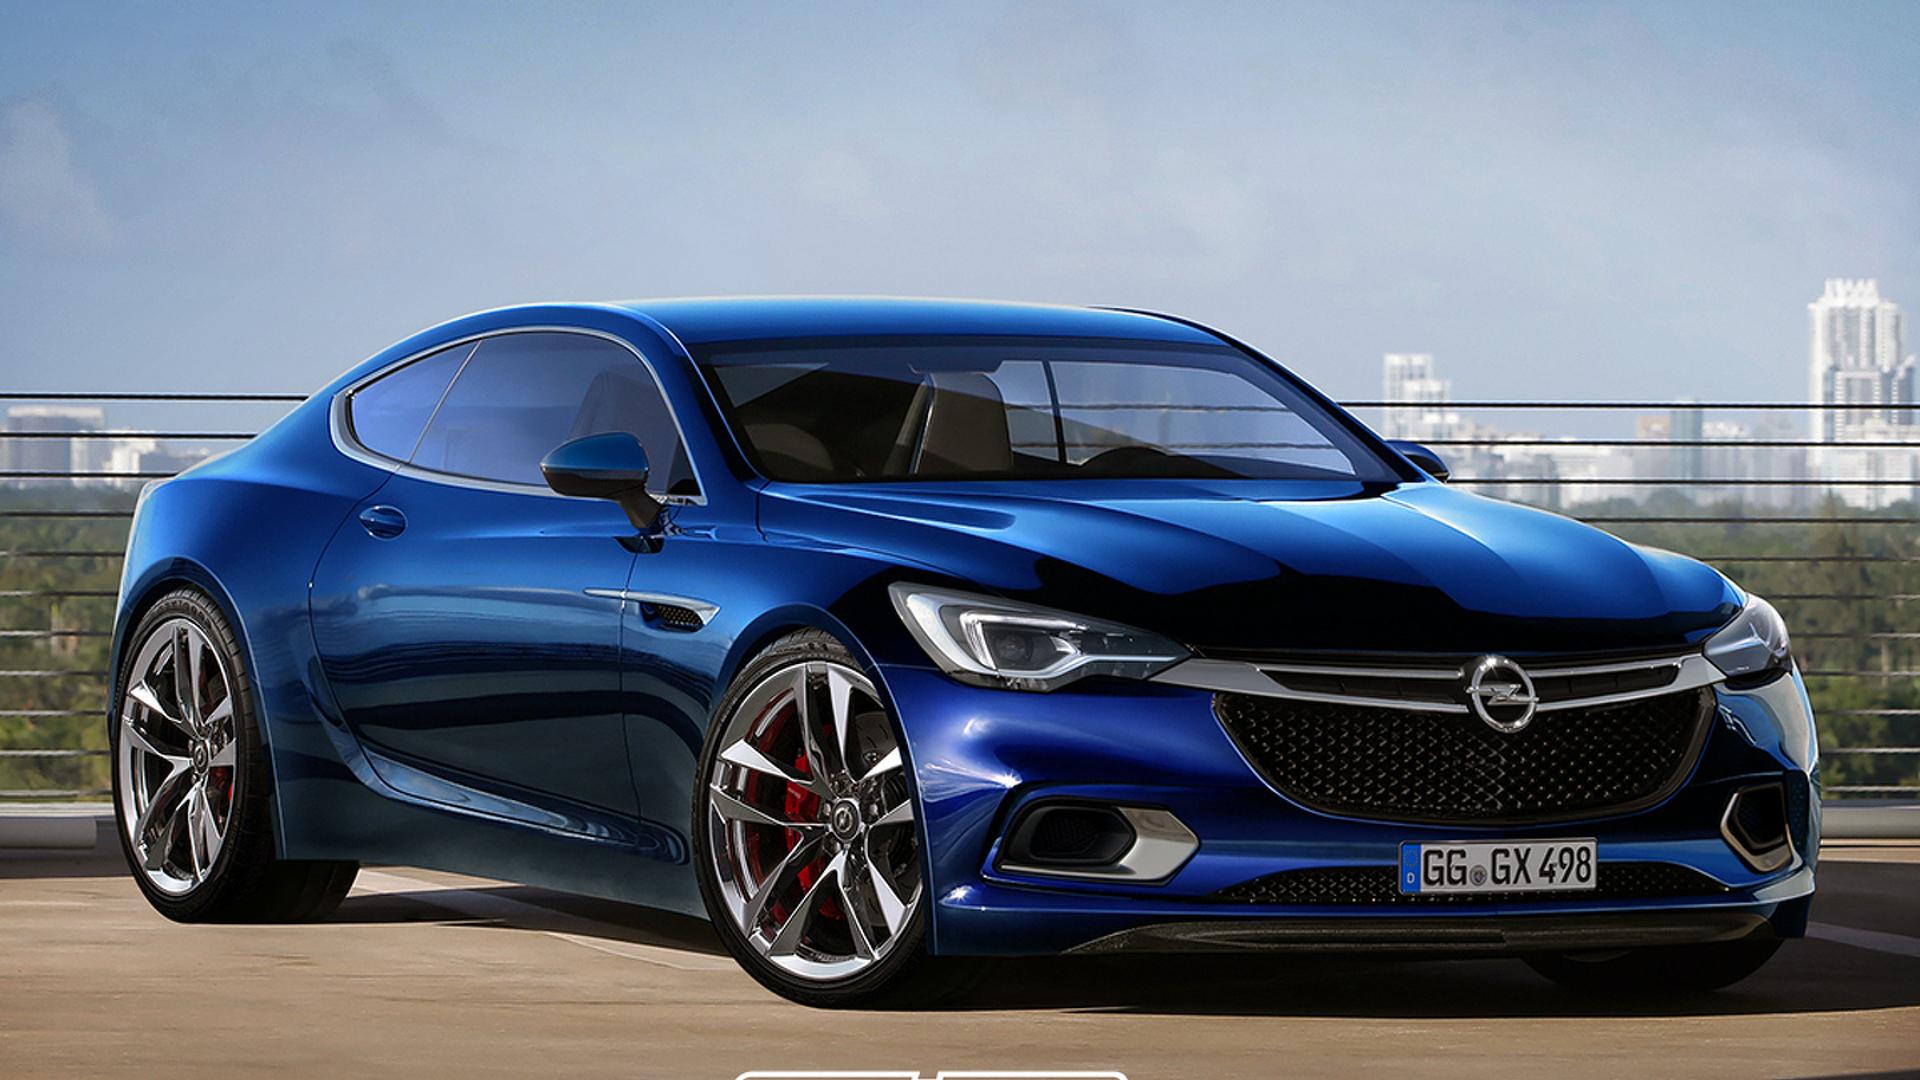 Buick Avista becomes Opel Calibra in digital world